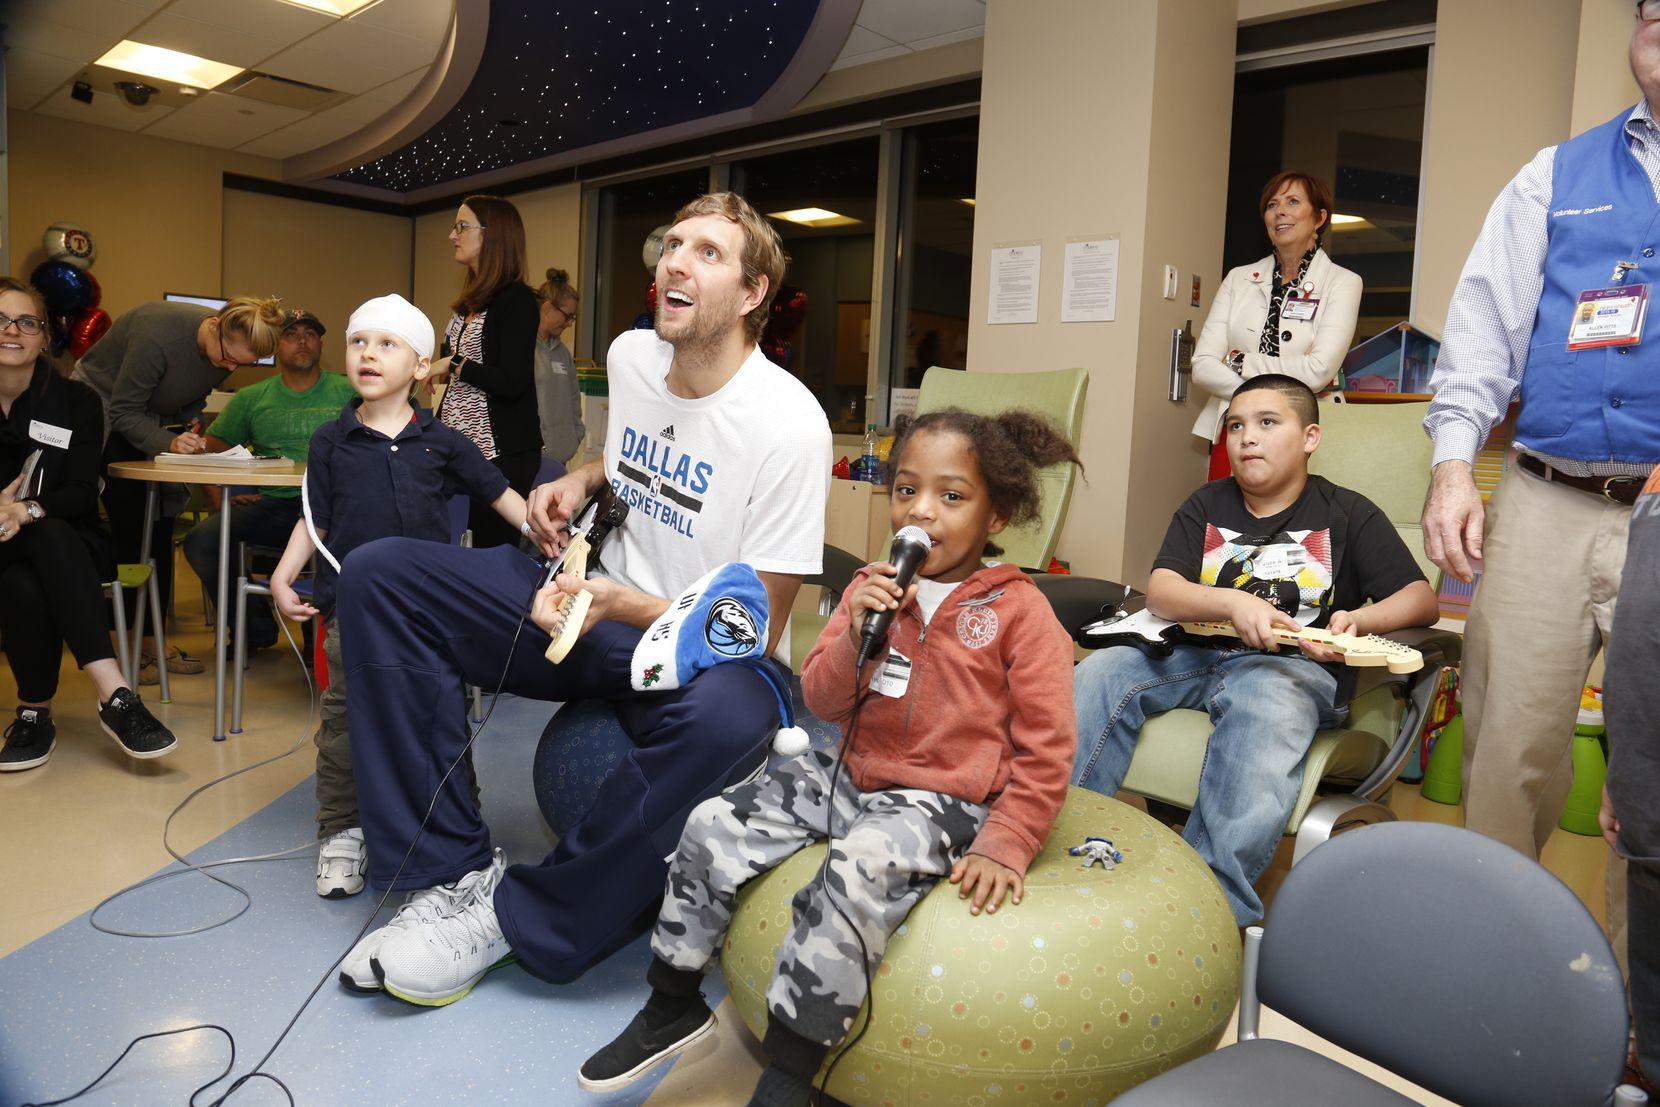 Dirk Nowitzki plays Guitar Hero with patients at Children's Medical Center on a recent visit.